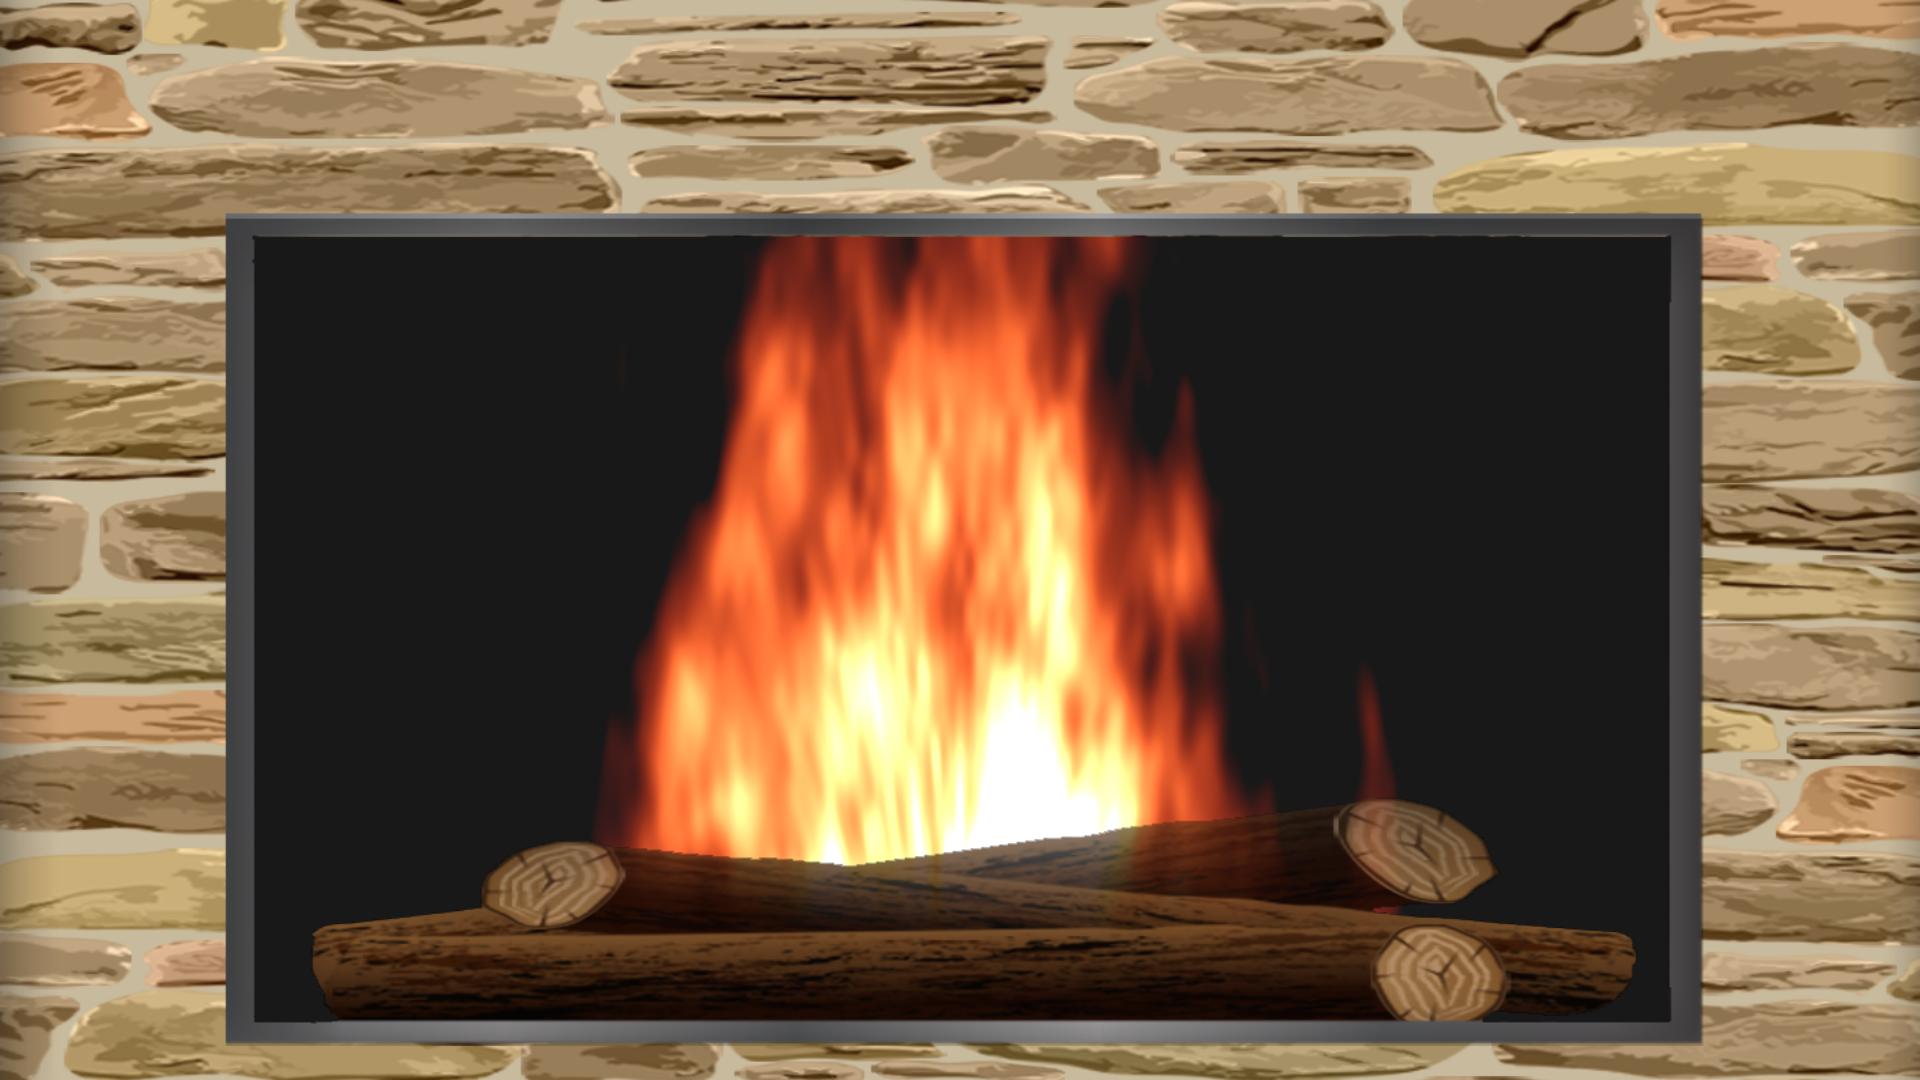 Sensory Flames - Free Fireplace for your TV screenshot 5